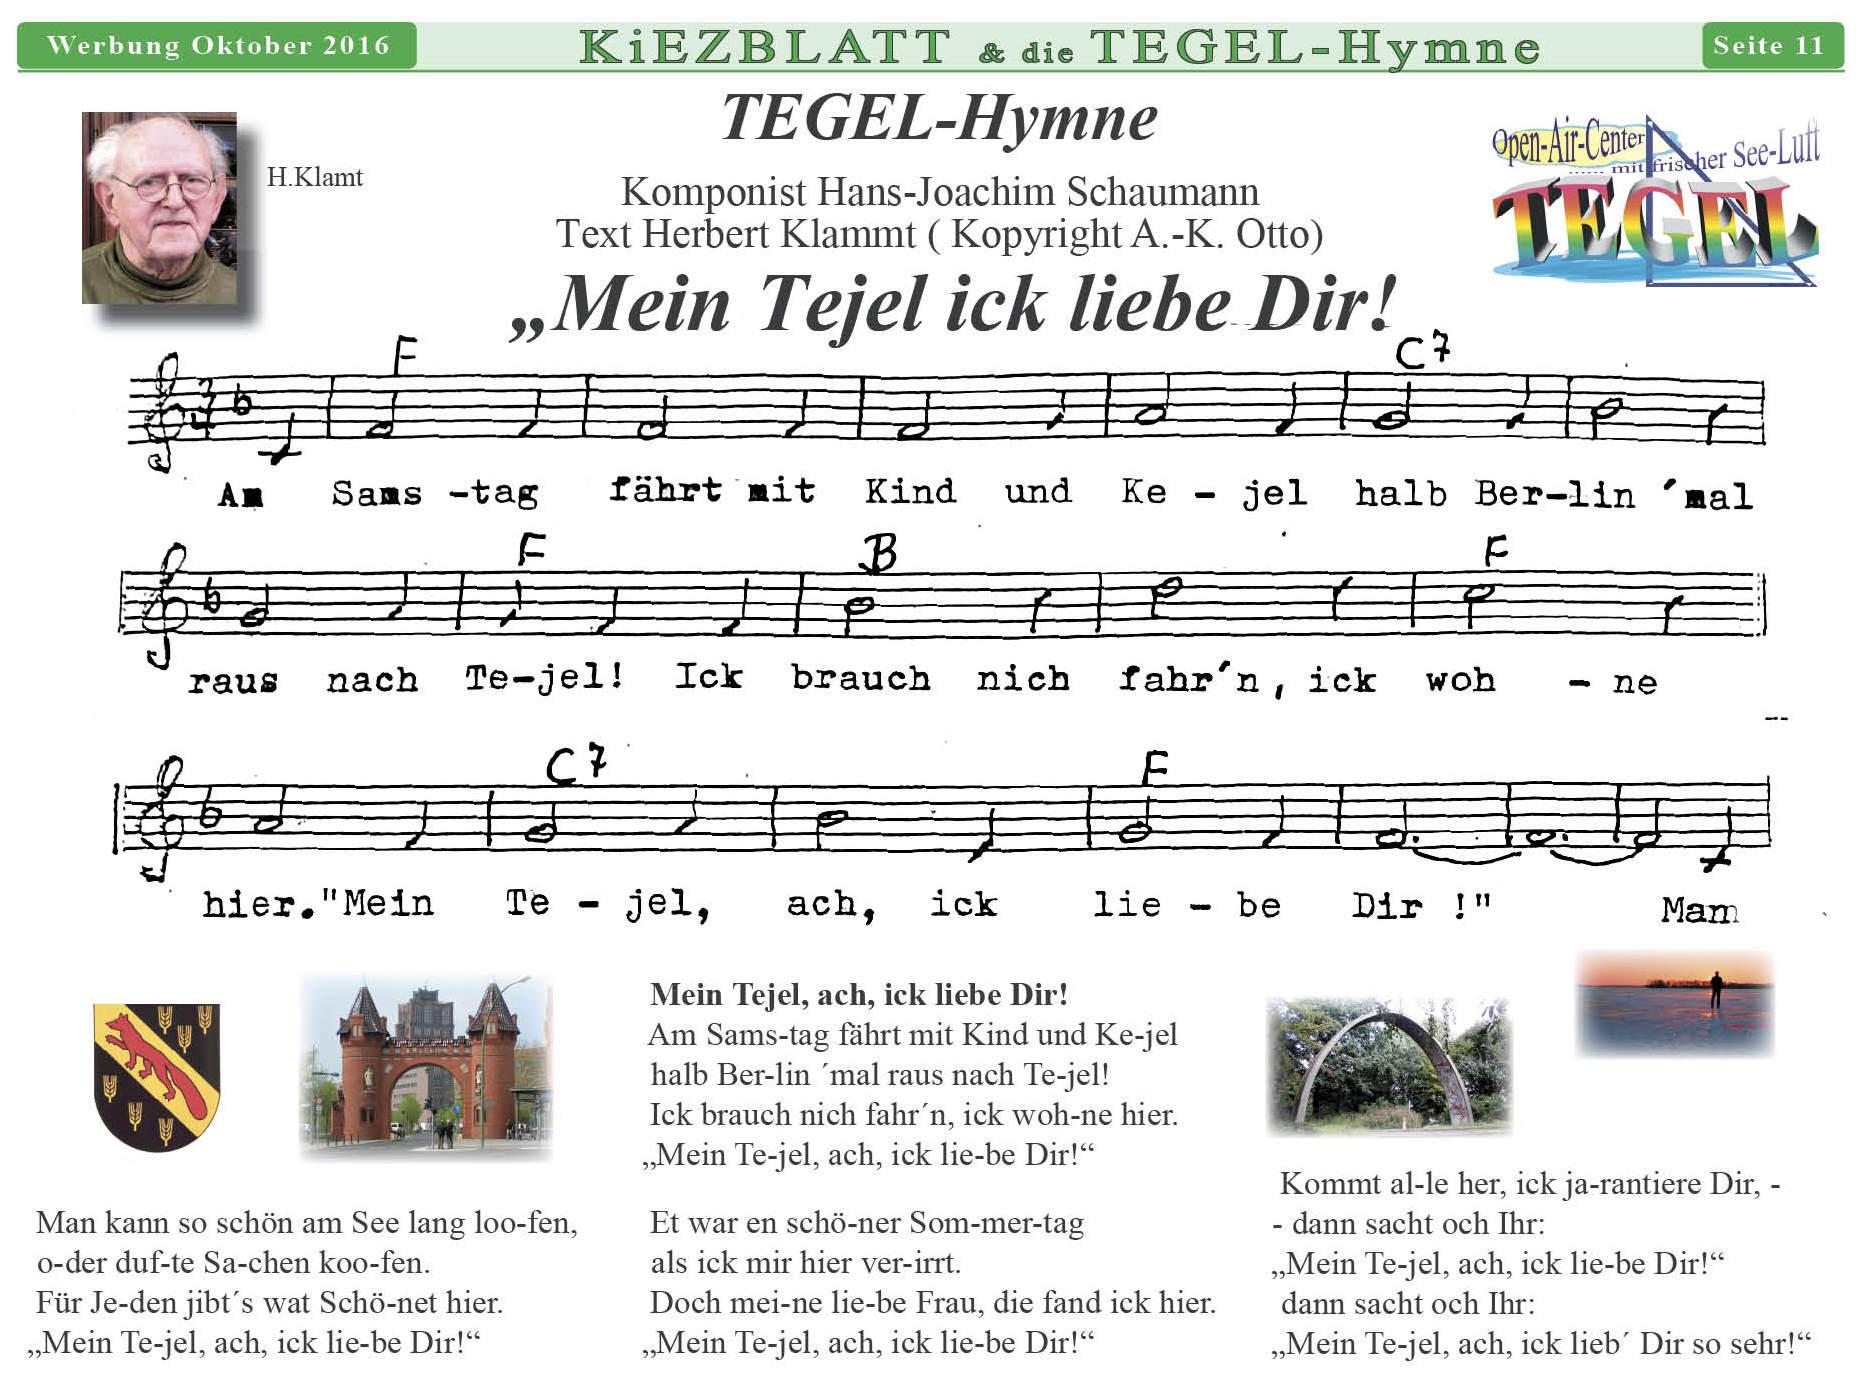 139-wp-11-tegelhymne